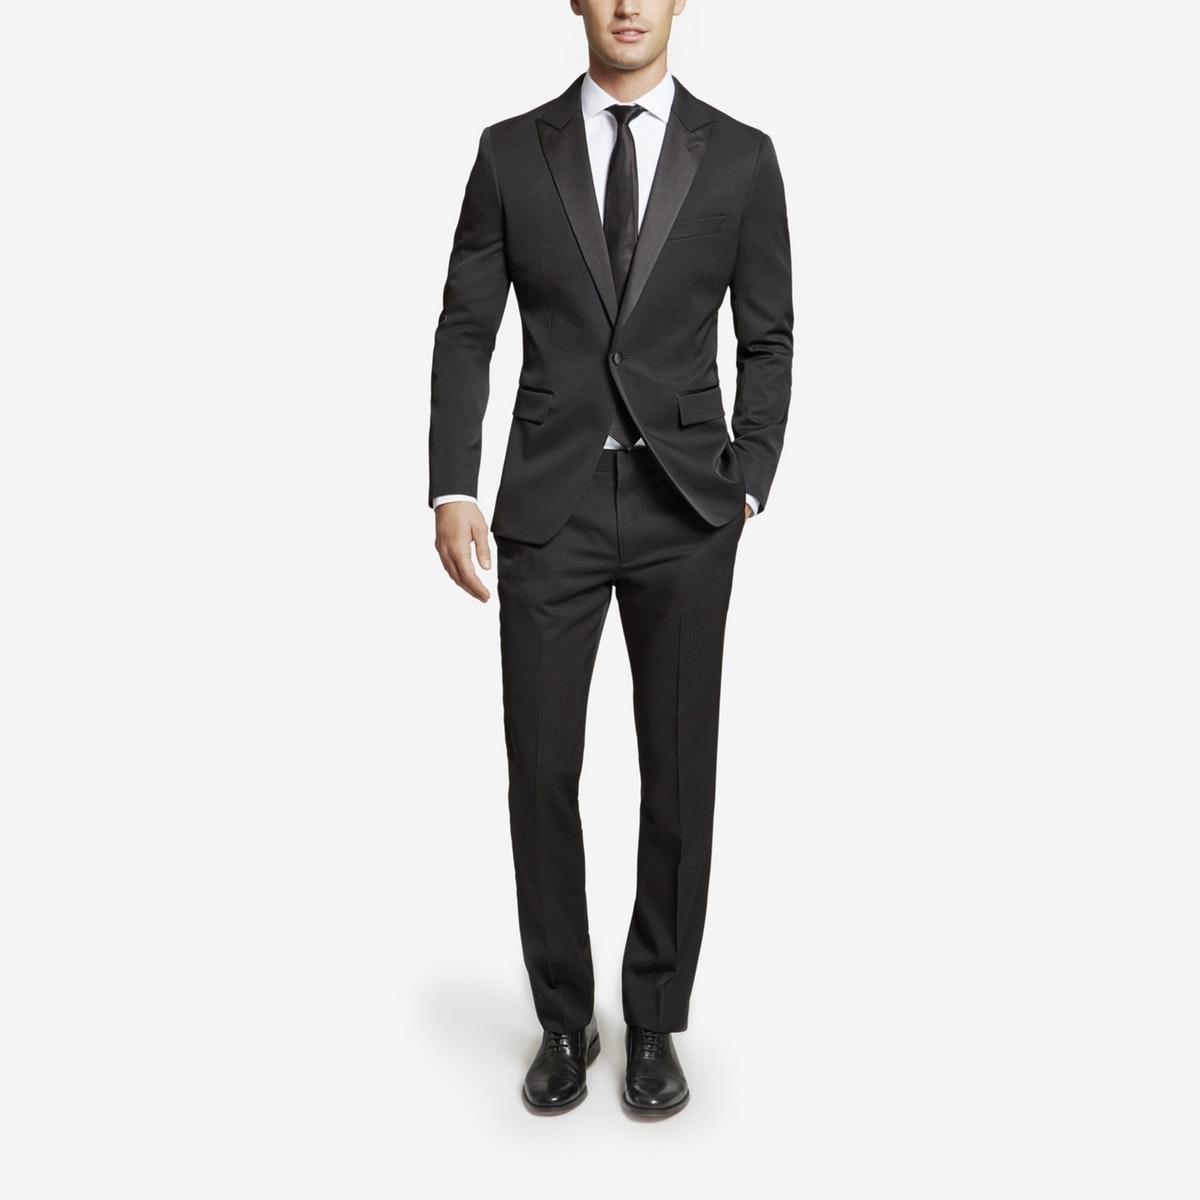 The Capstone Tuxedo